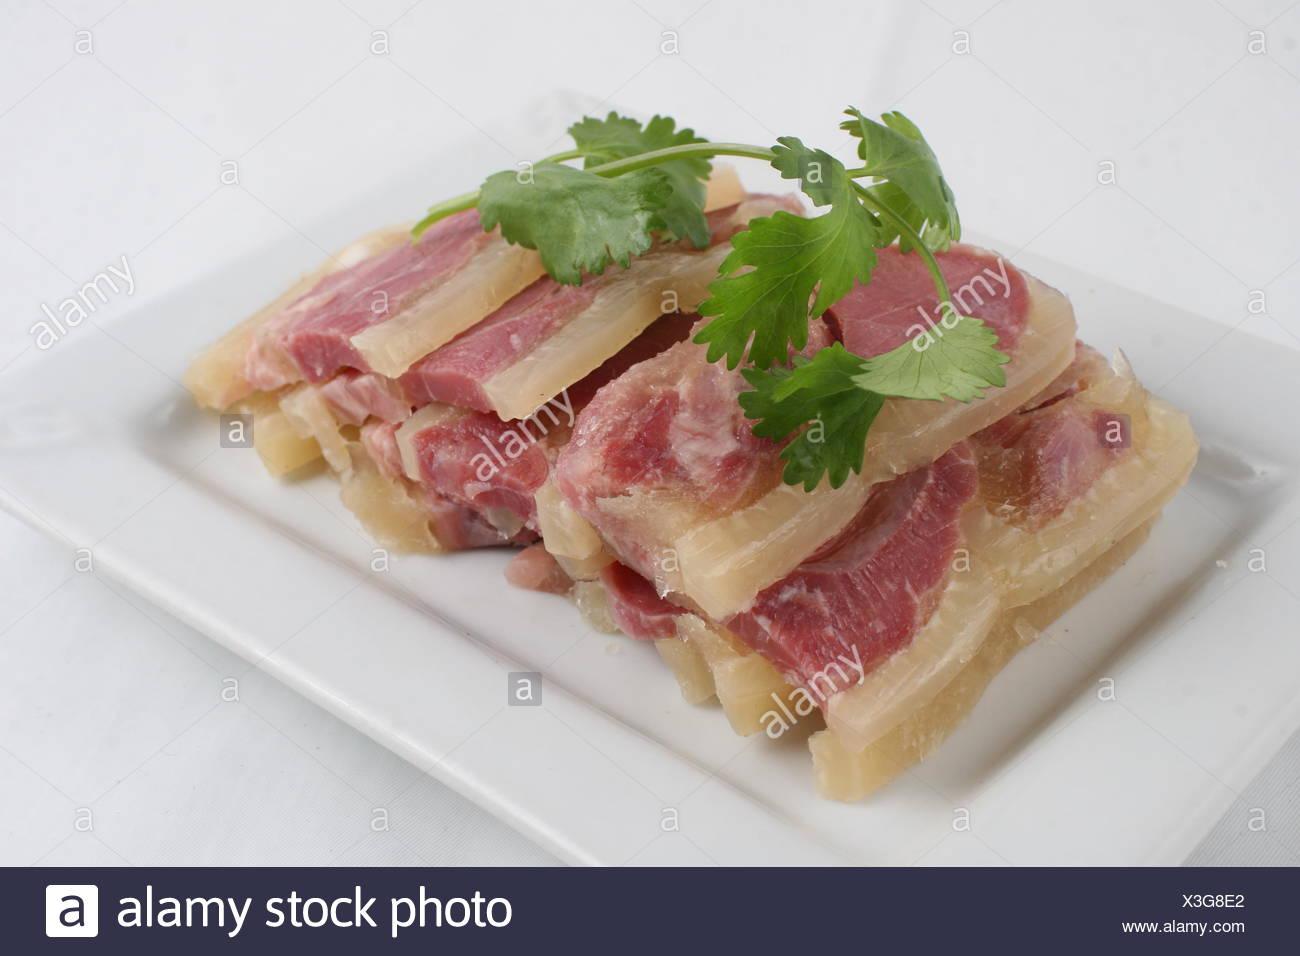 salted pork in jelly Stock Photo: 277567754 - Alamy